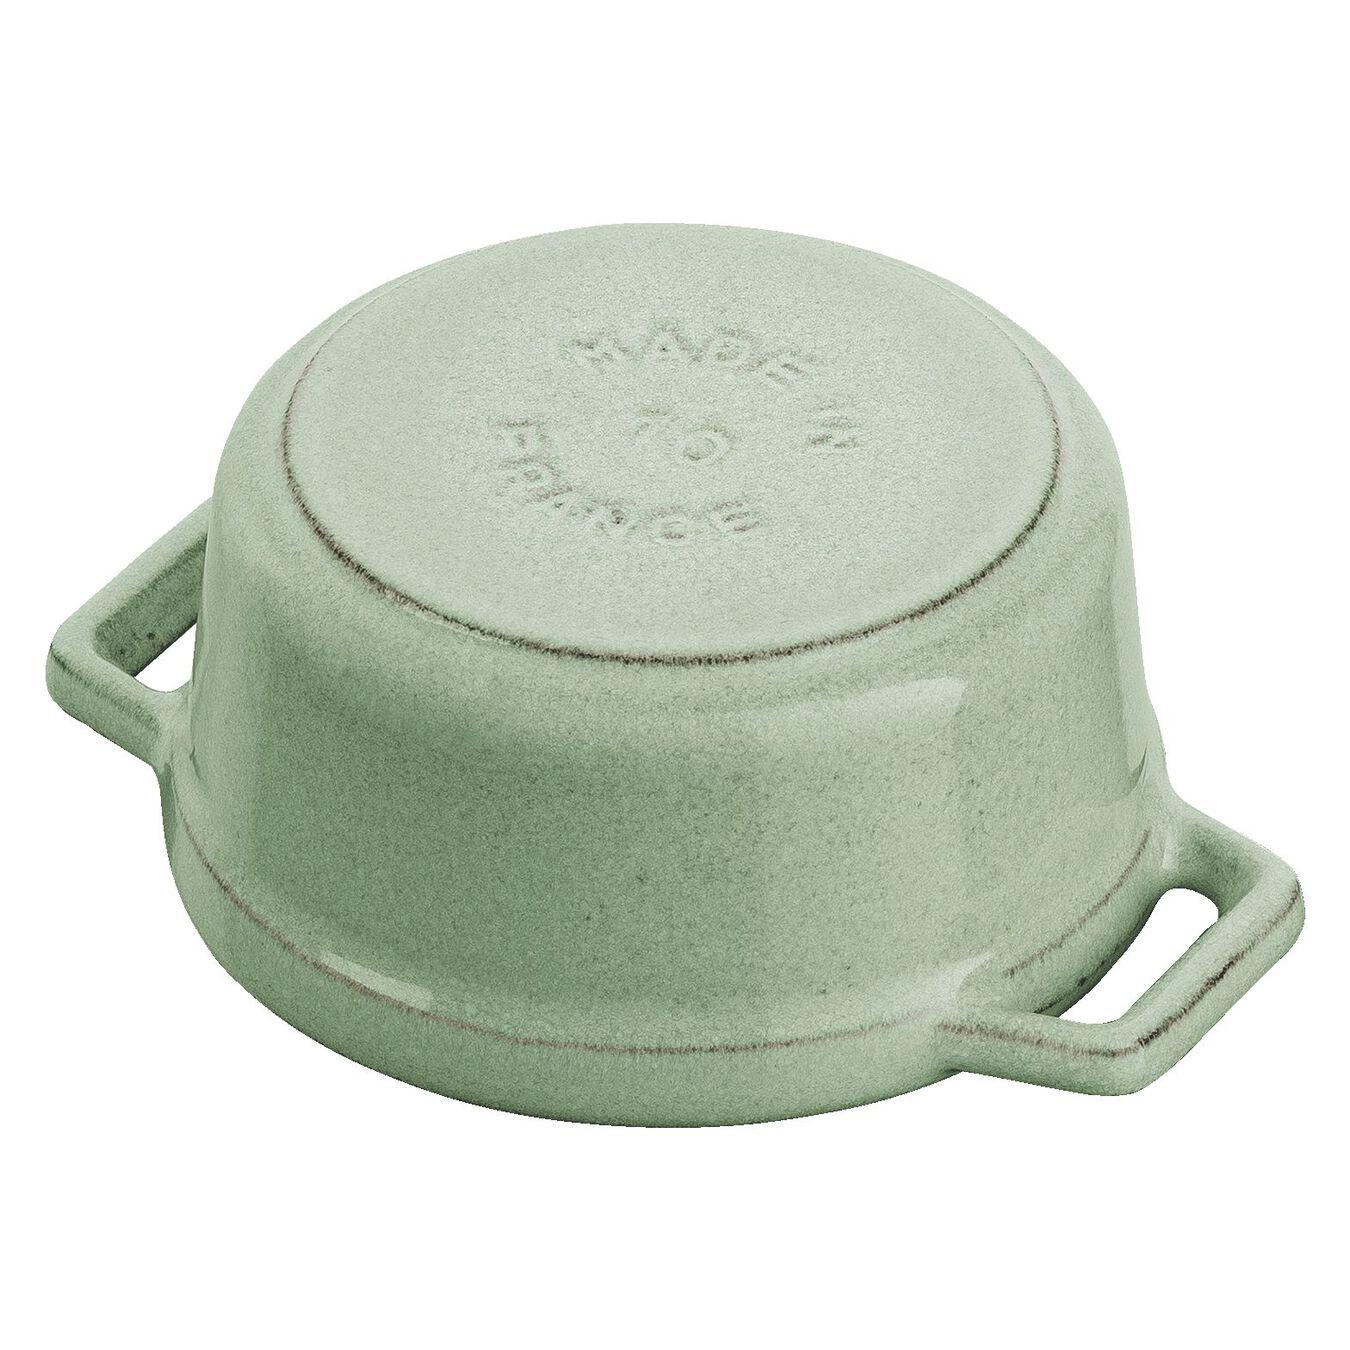 Mini cocotte rotonda - 10 cm, verde salvia,,large 5